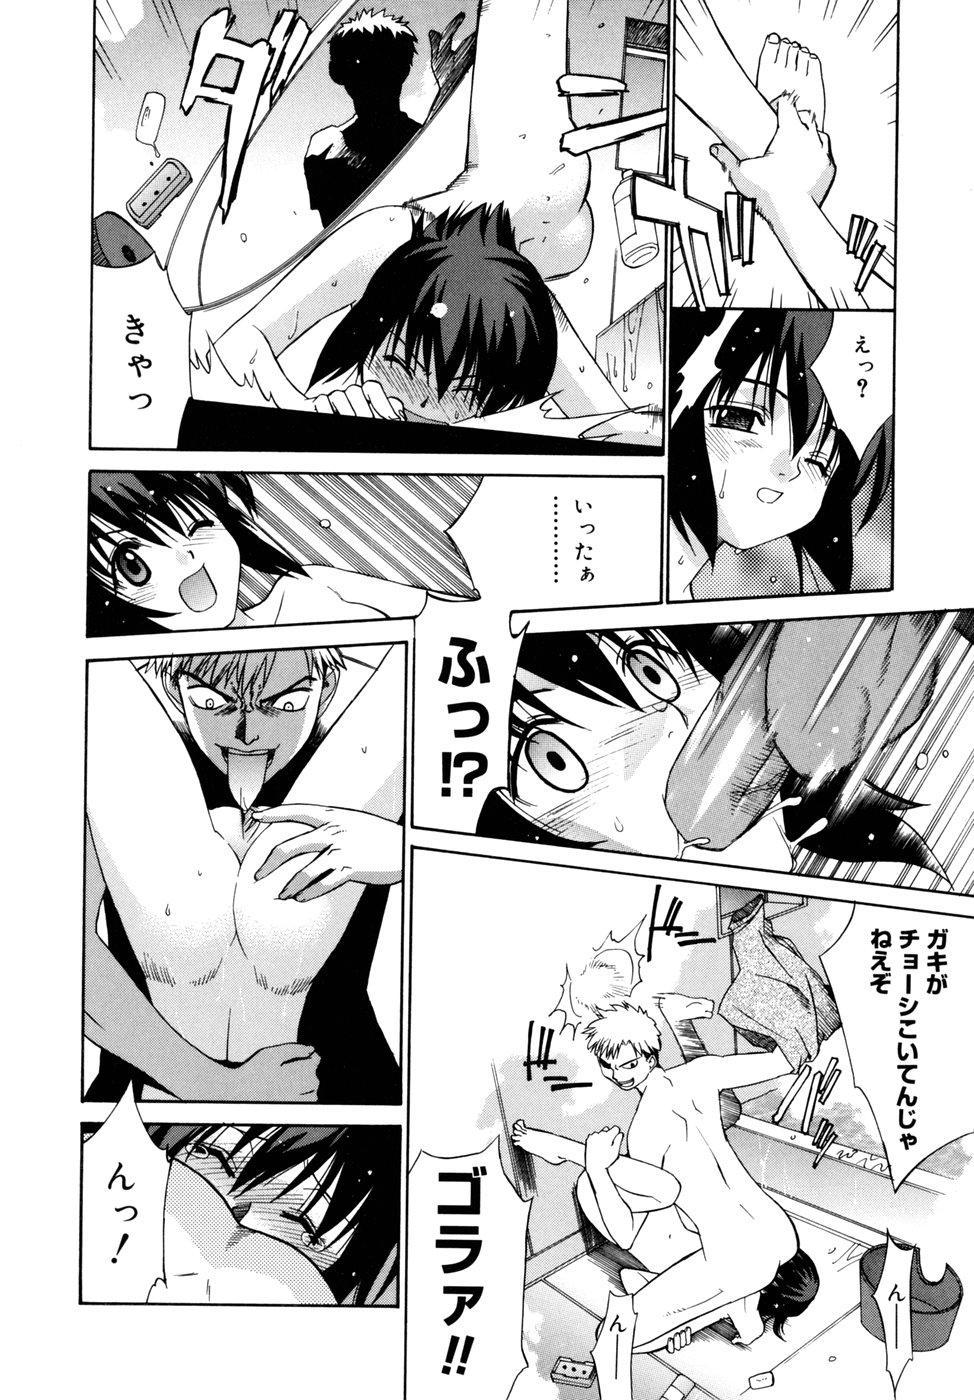 [Yaya Hinata] Tonari no Miko-san wa Minna Warau - The next shrine maidens smile in everyone. 207